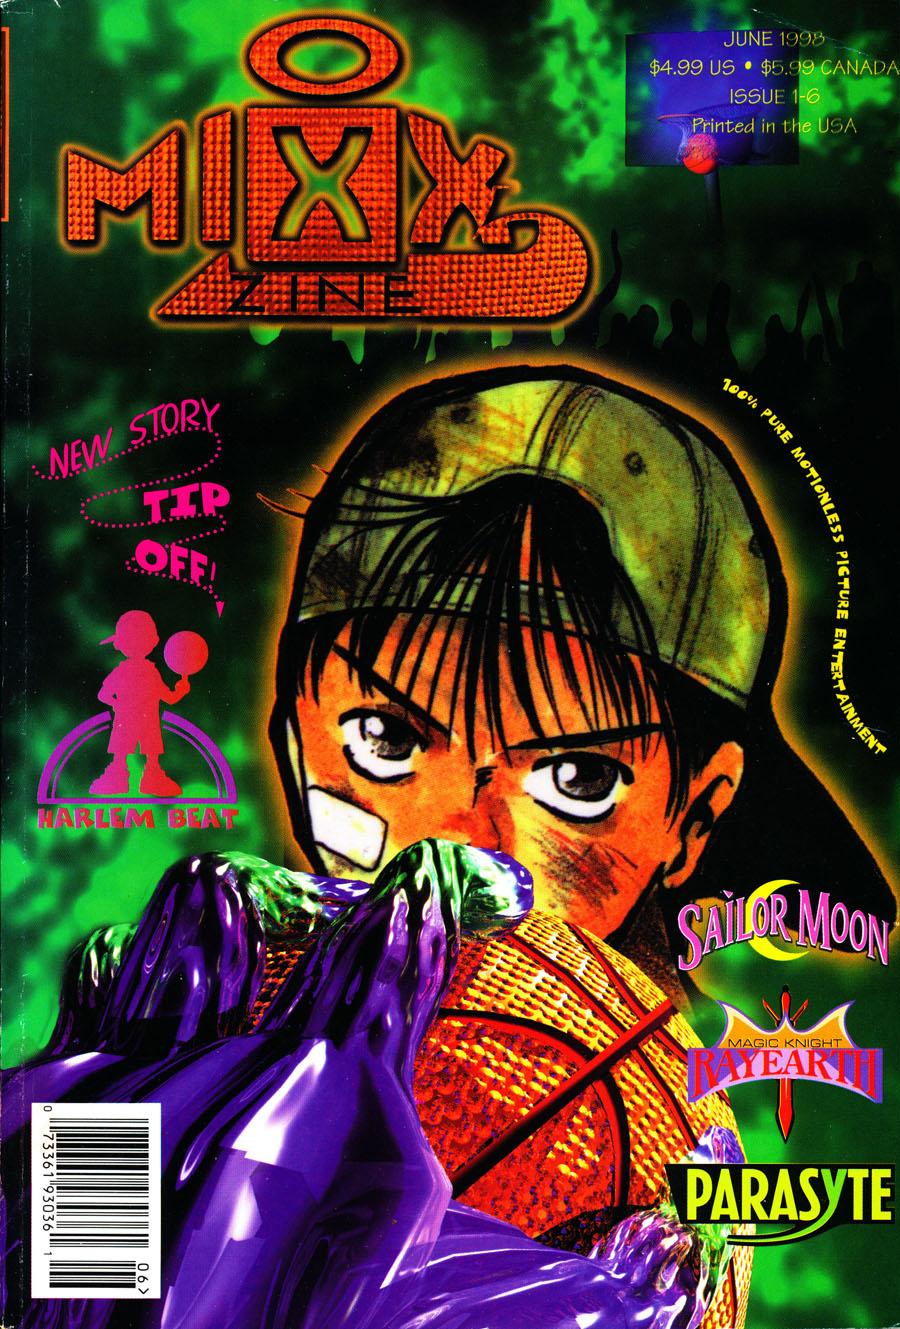 mixx-zine-manga-june-1998-issue-6-harlem-beat